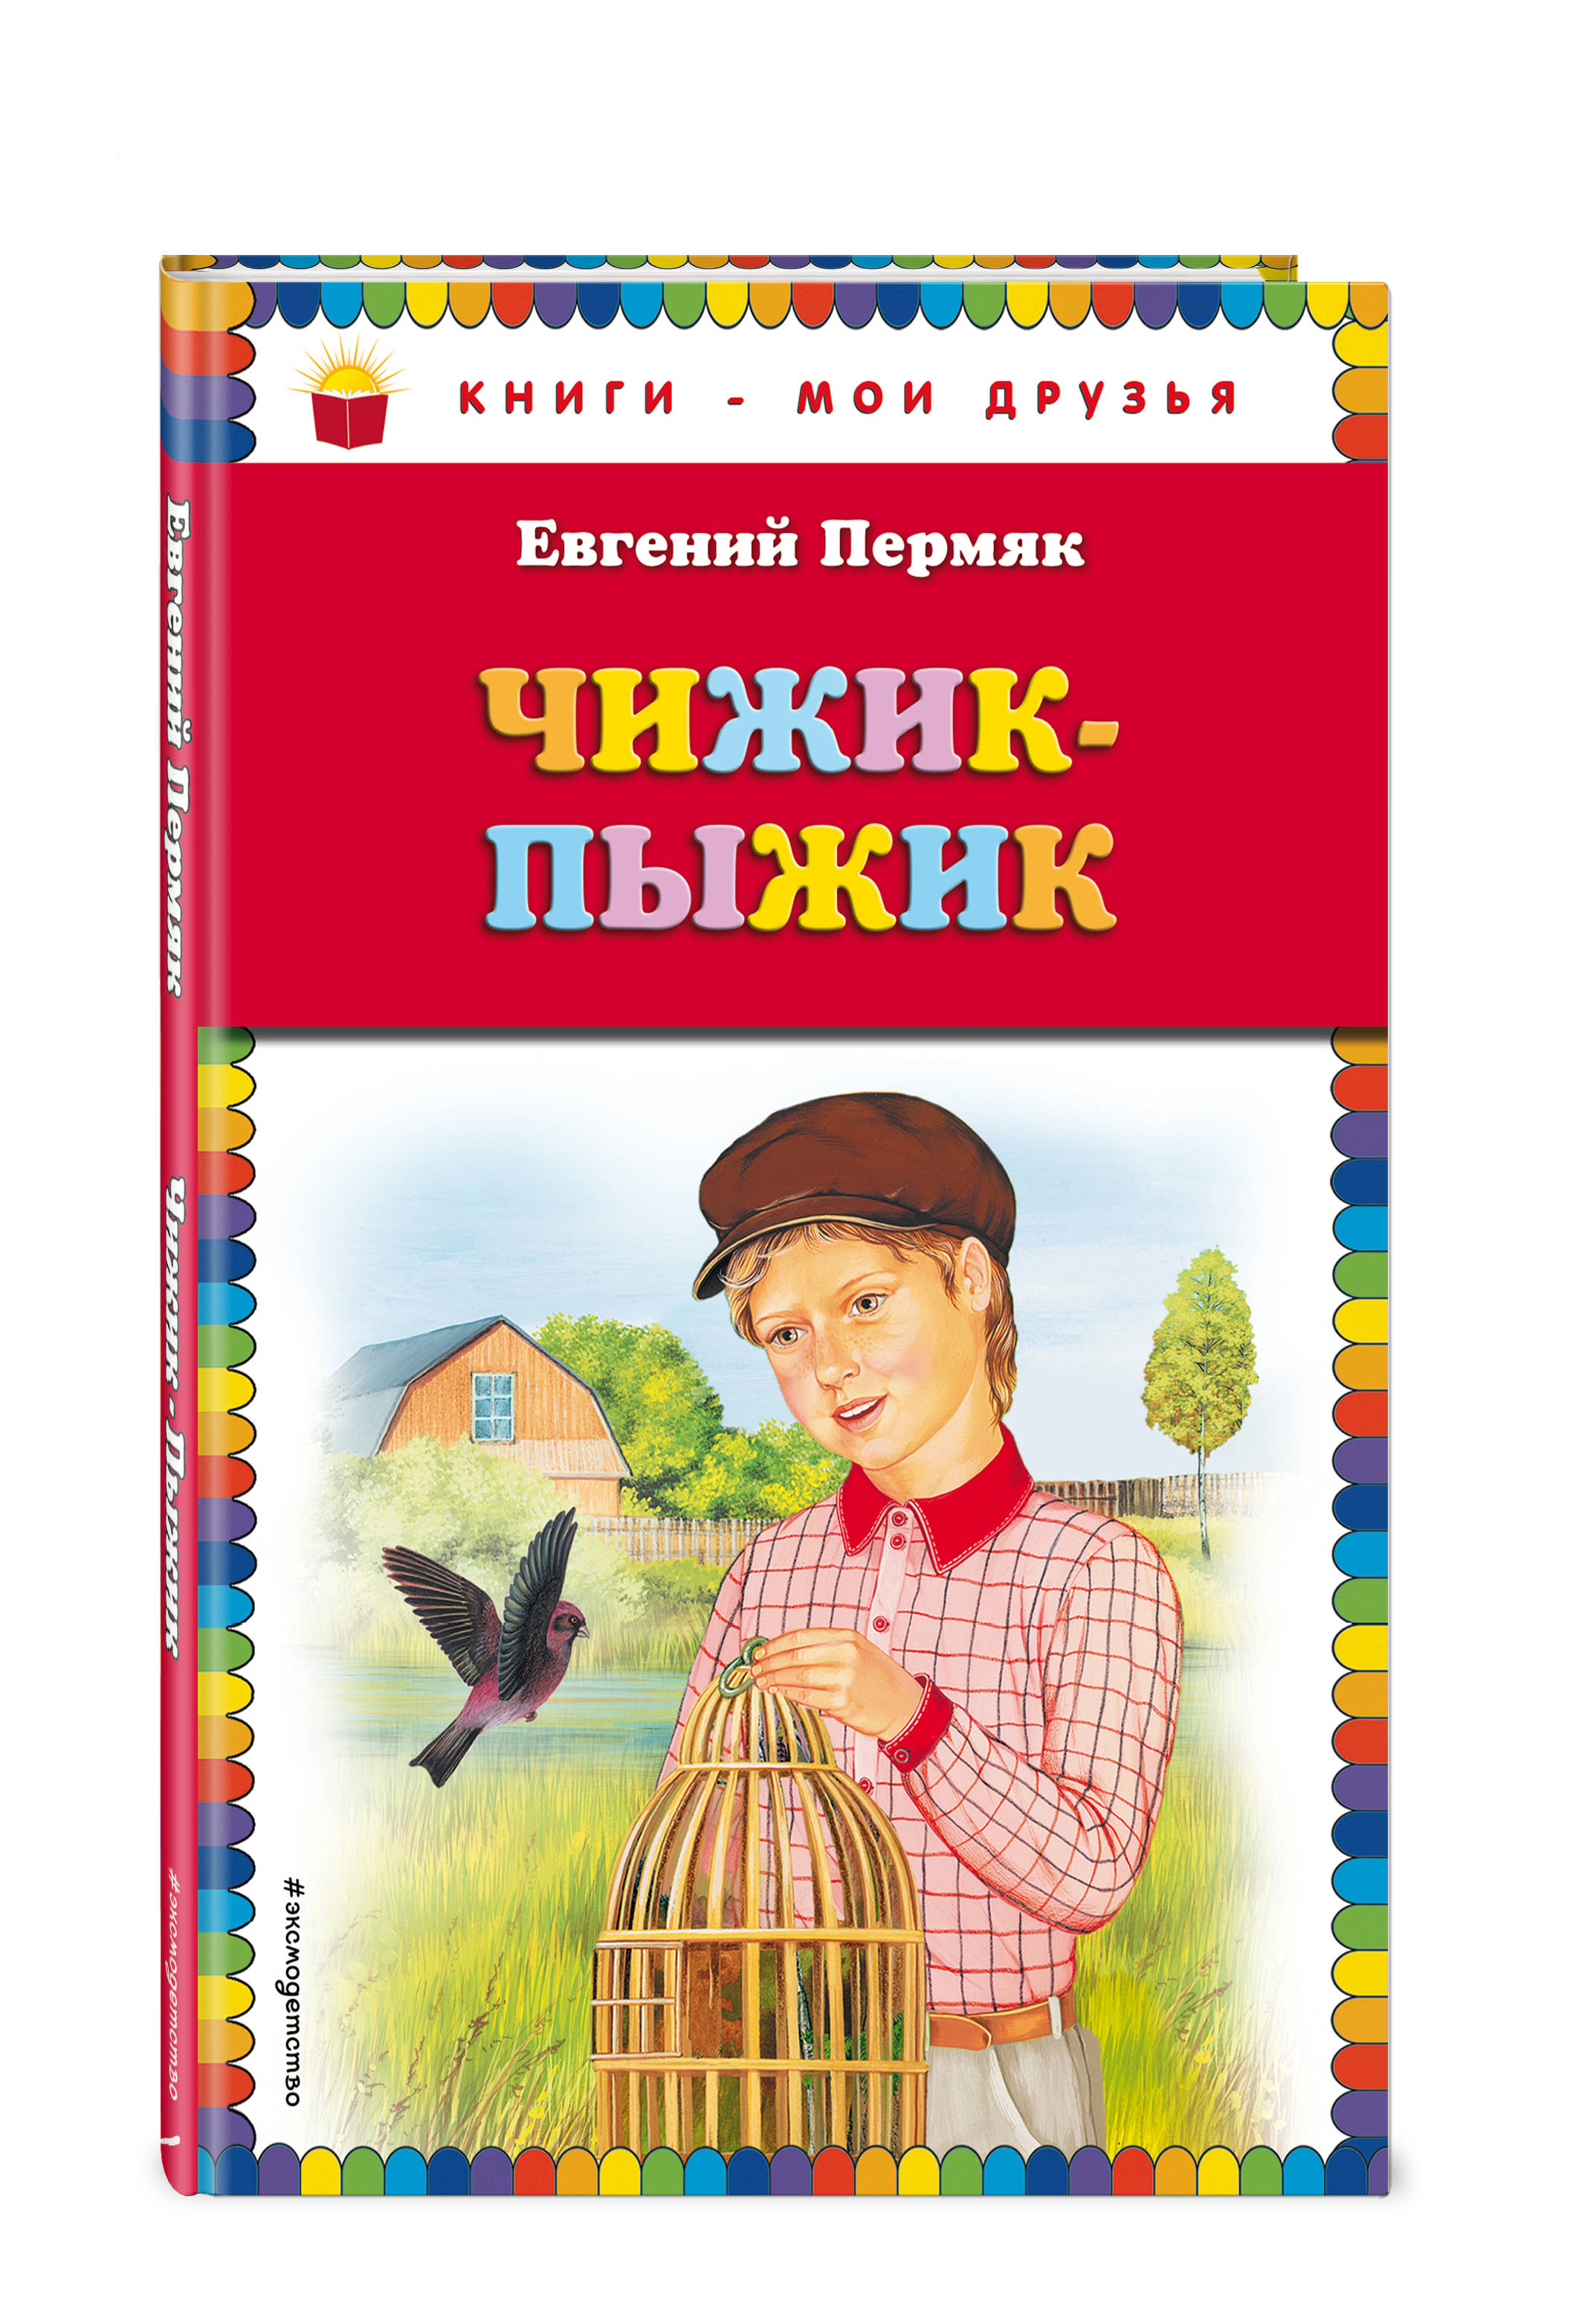 Евгений Пермяк Чижик-Пыжик евгений пермяк волшебные краски